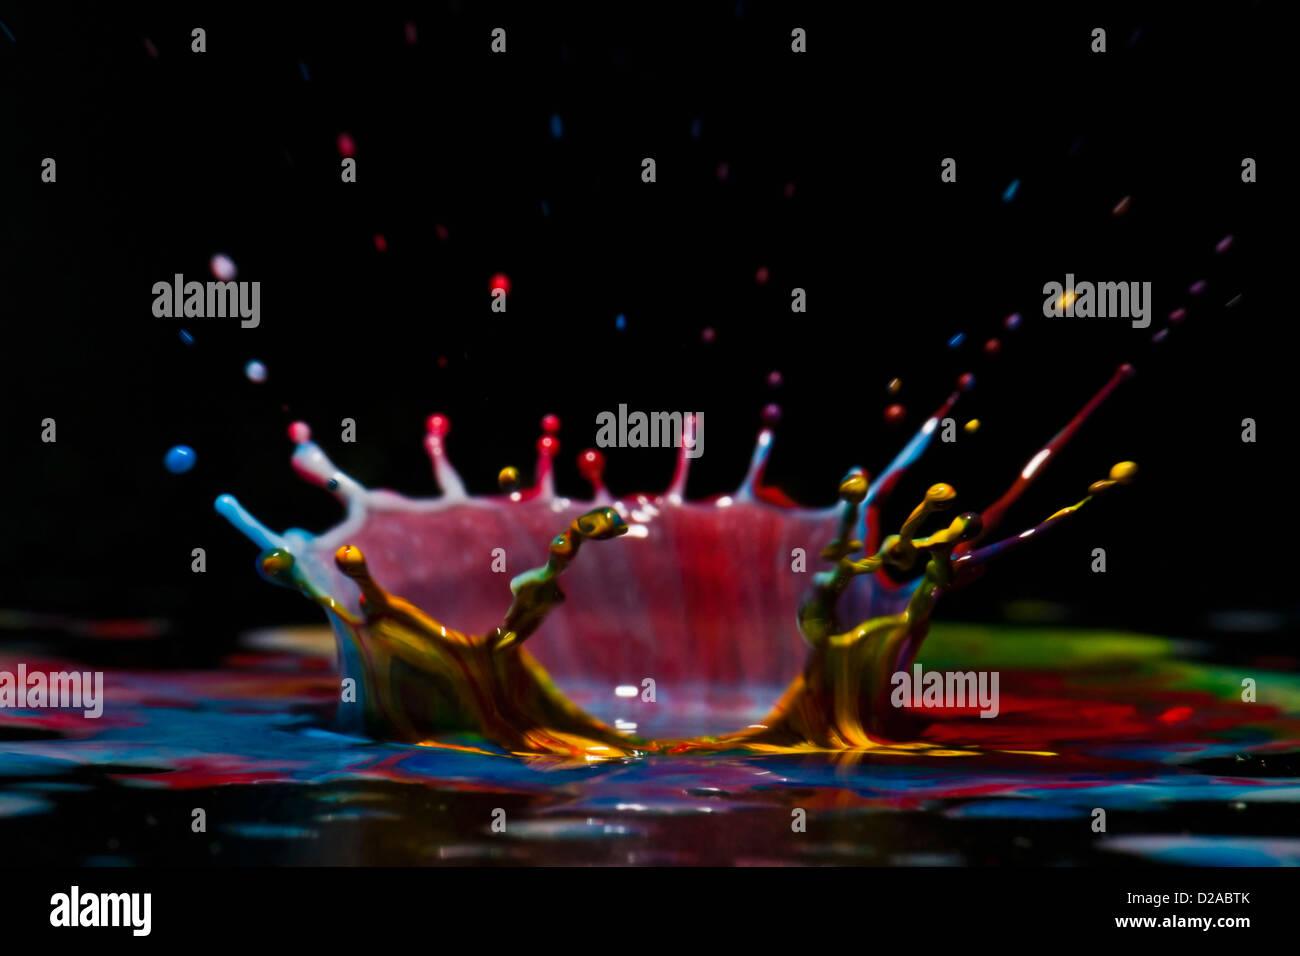 Close up of splash of paint - Stock Image